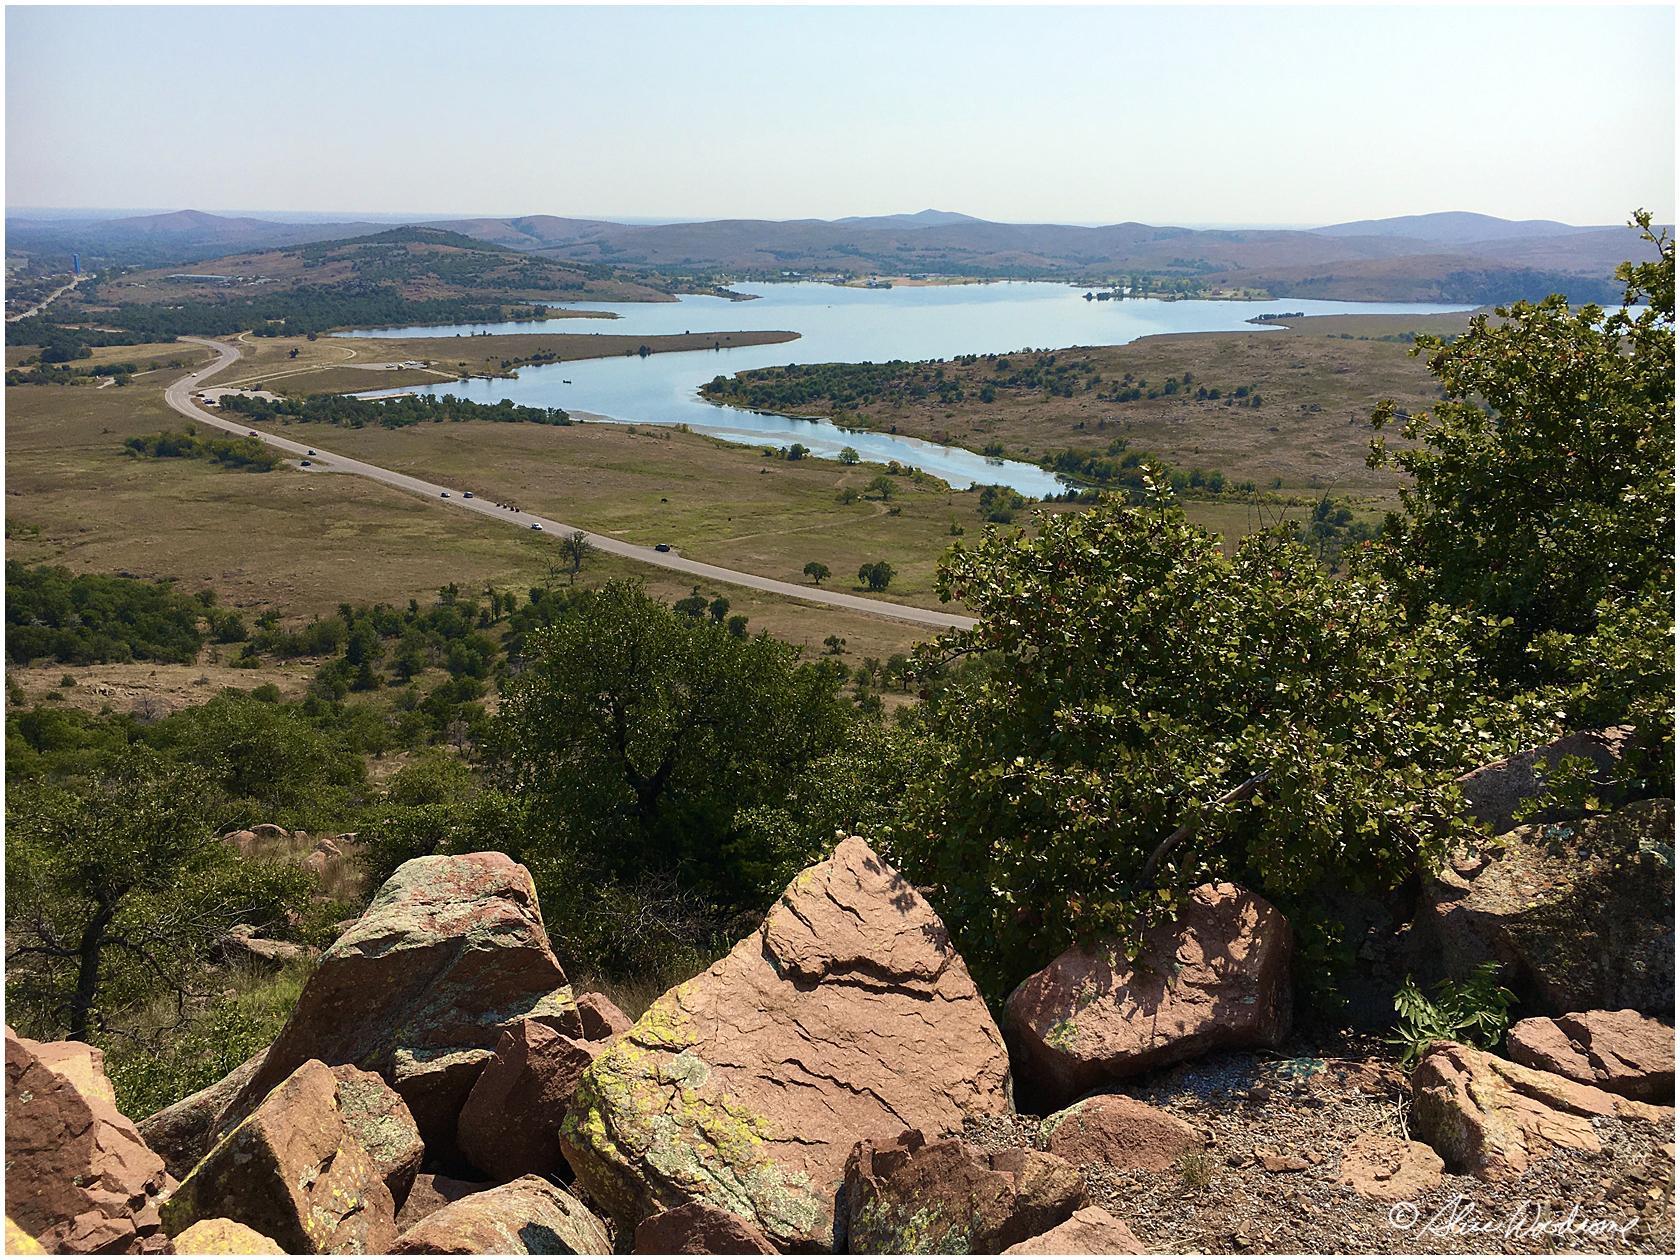 View on Mount Scott